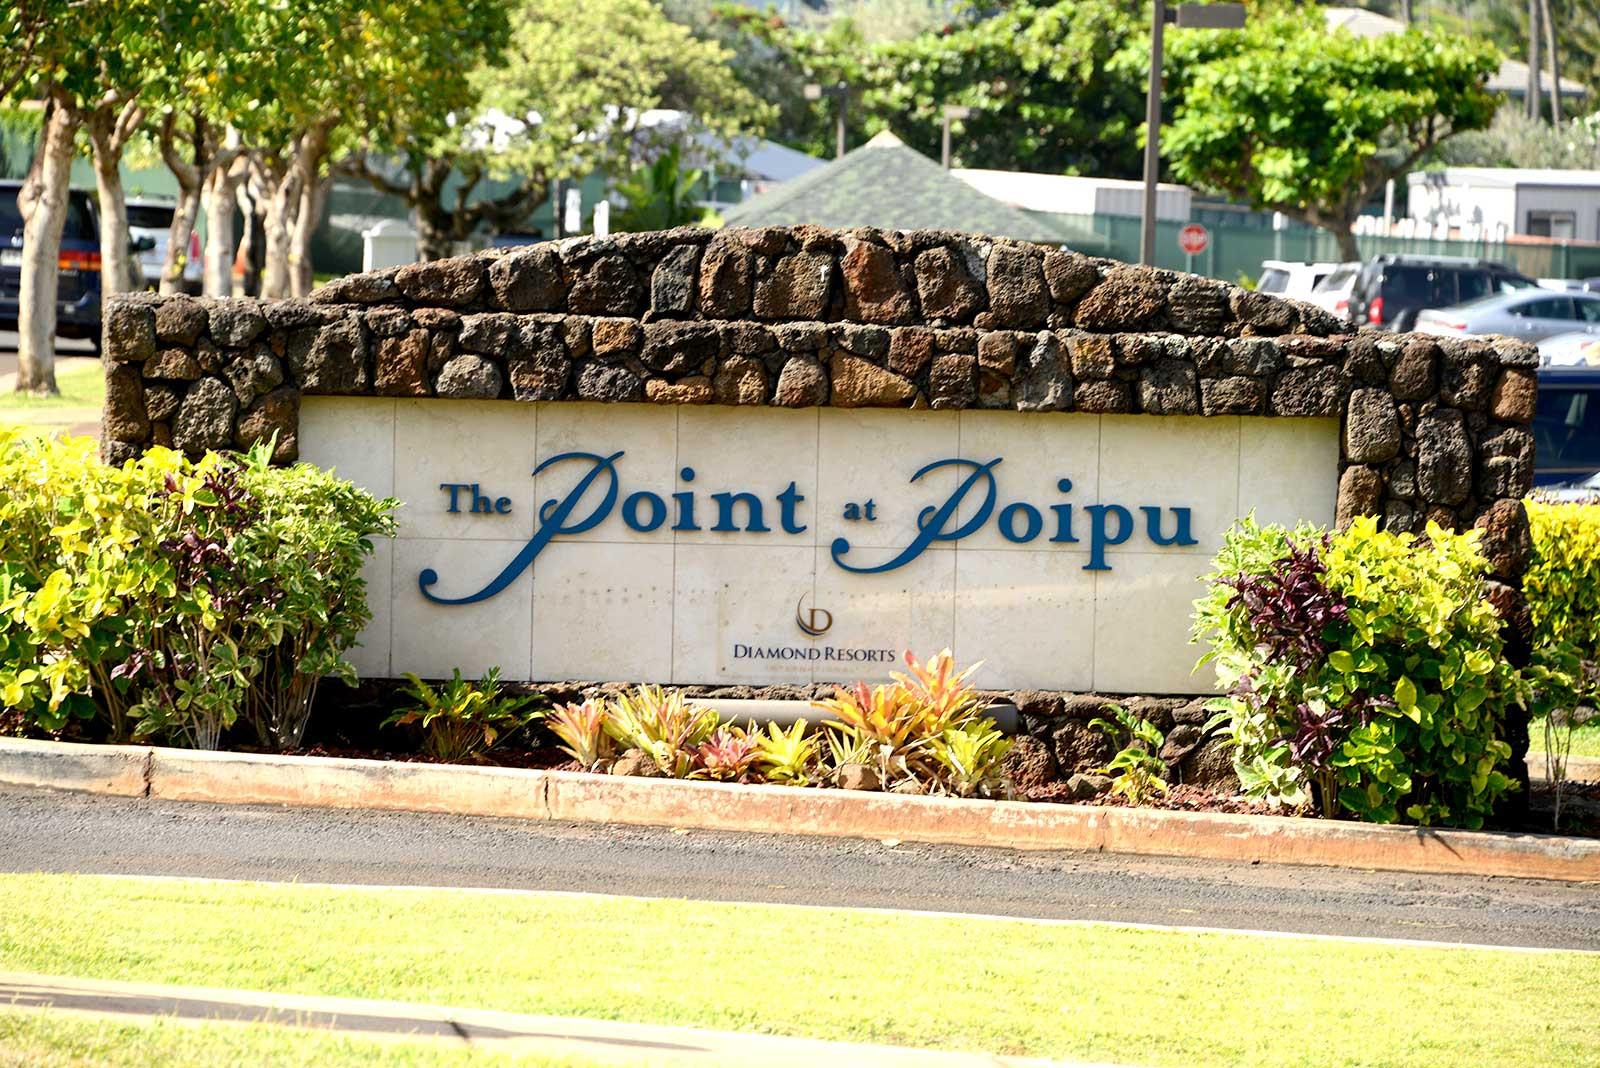 Diamond Resorts - The Point at Poipu, Kauai